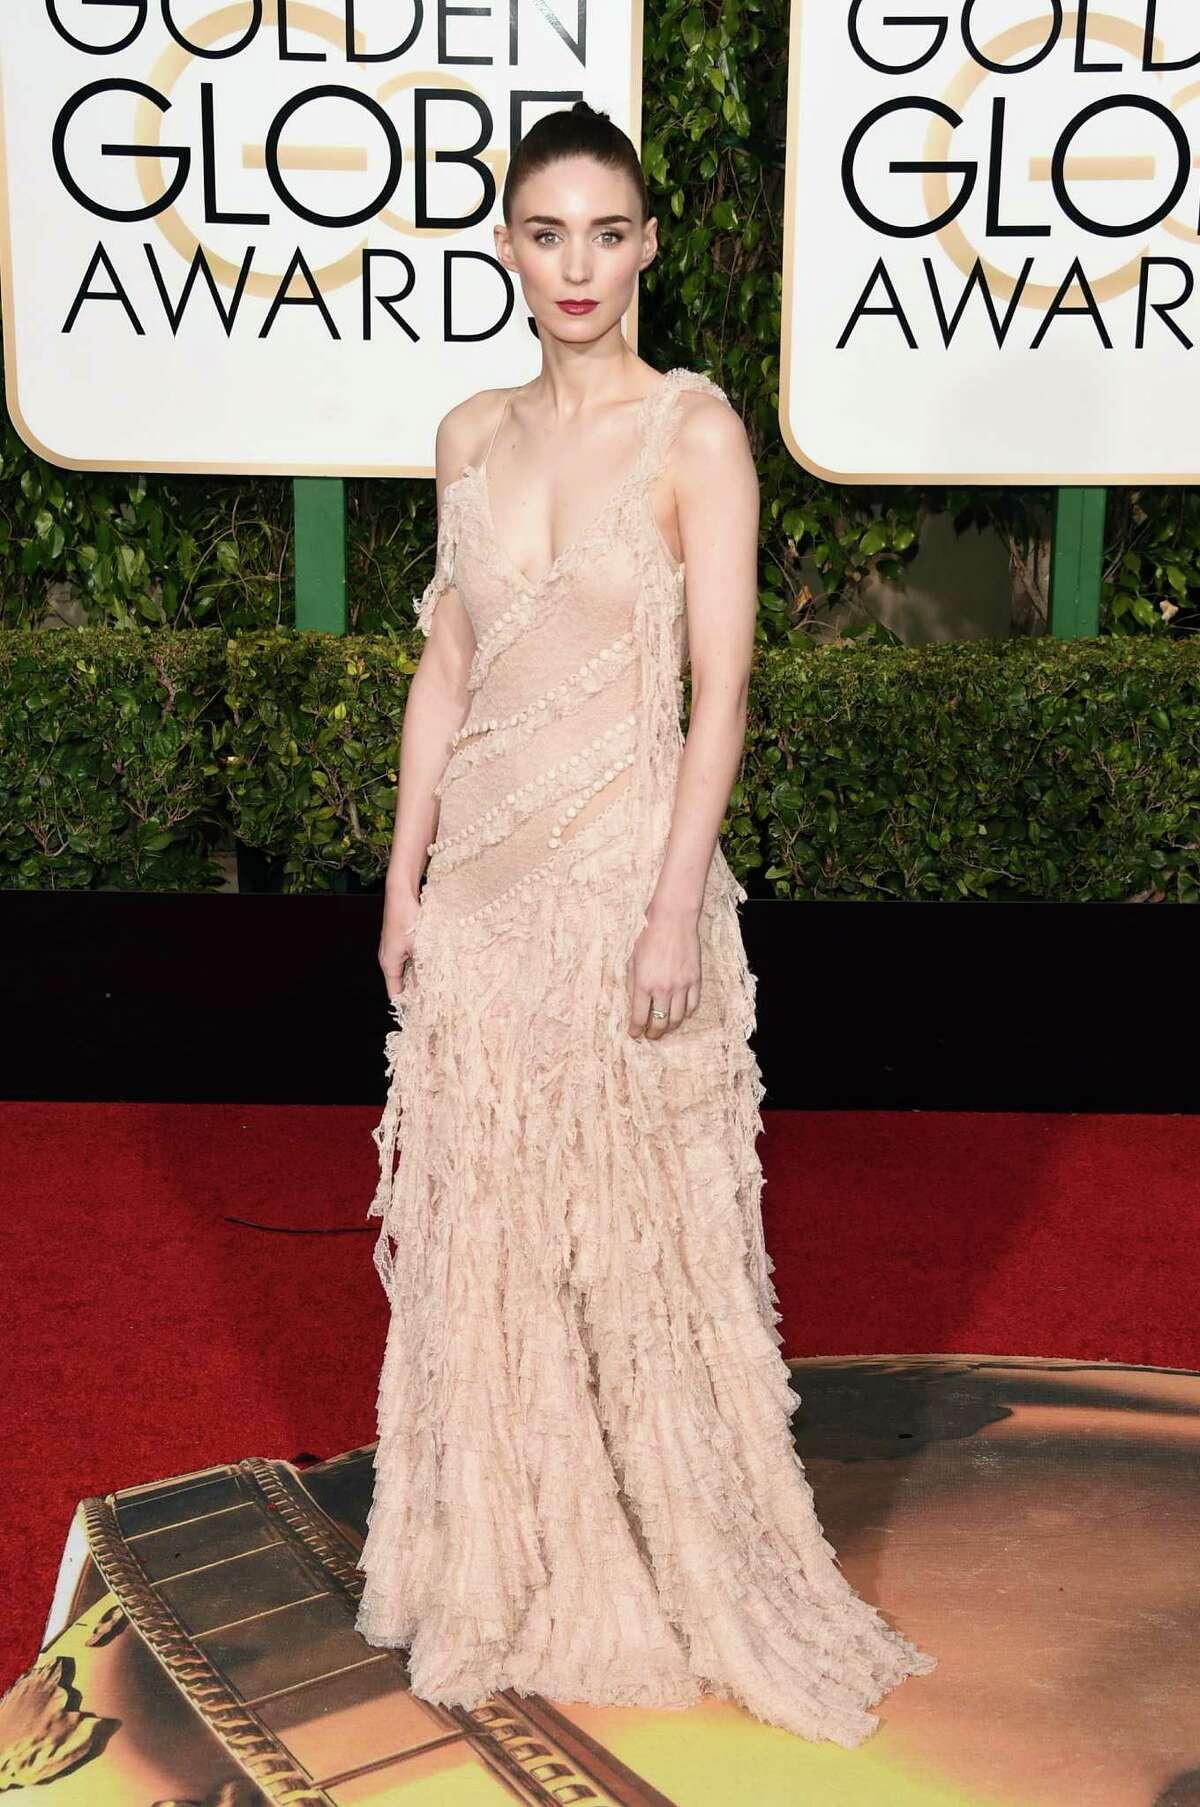 Rooney Mara: Alexander McQueen ruffles. Period.